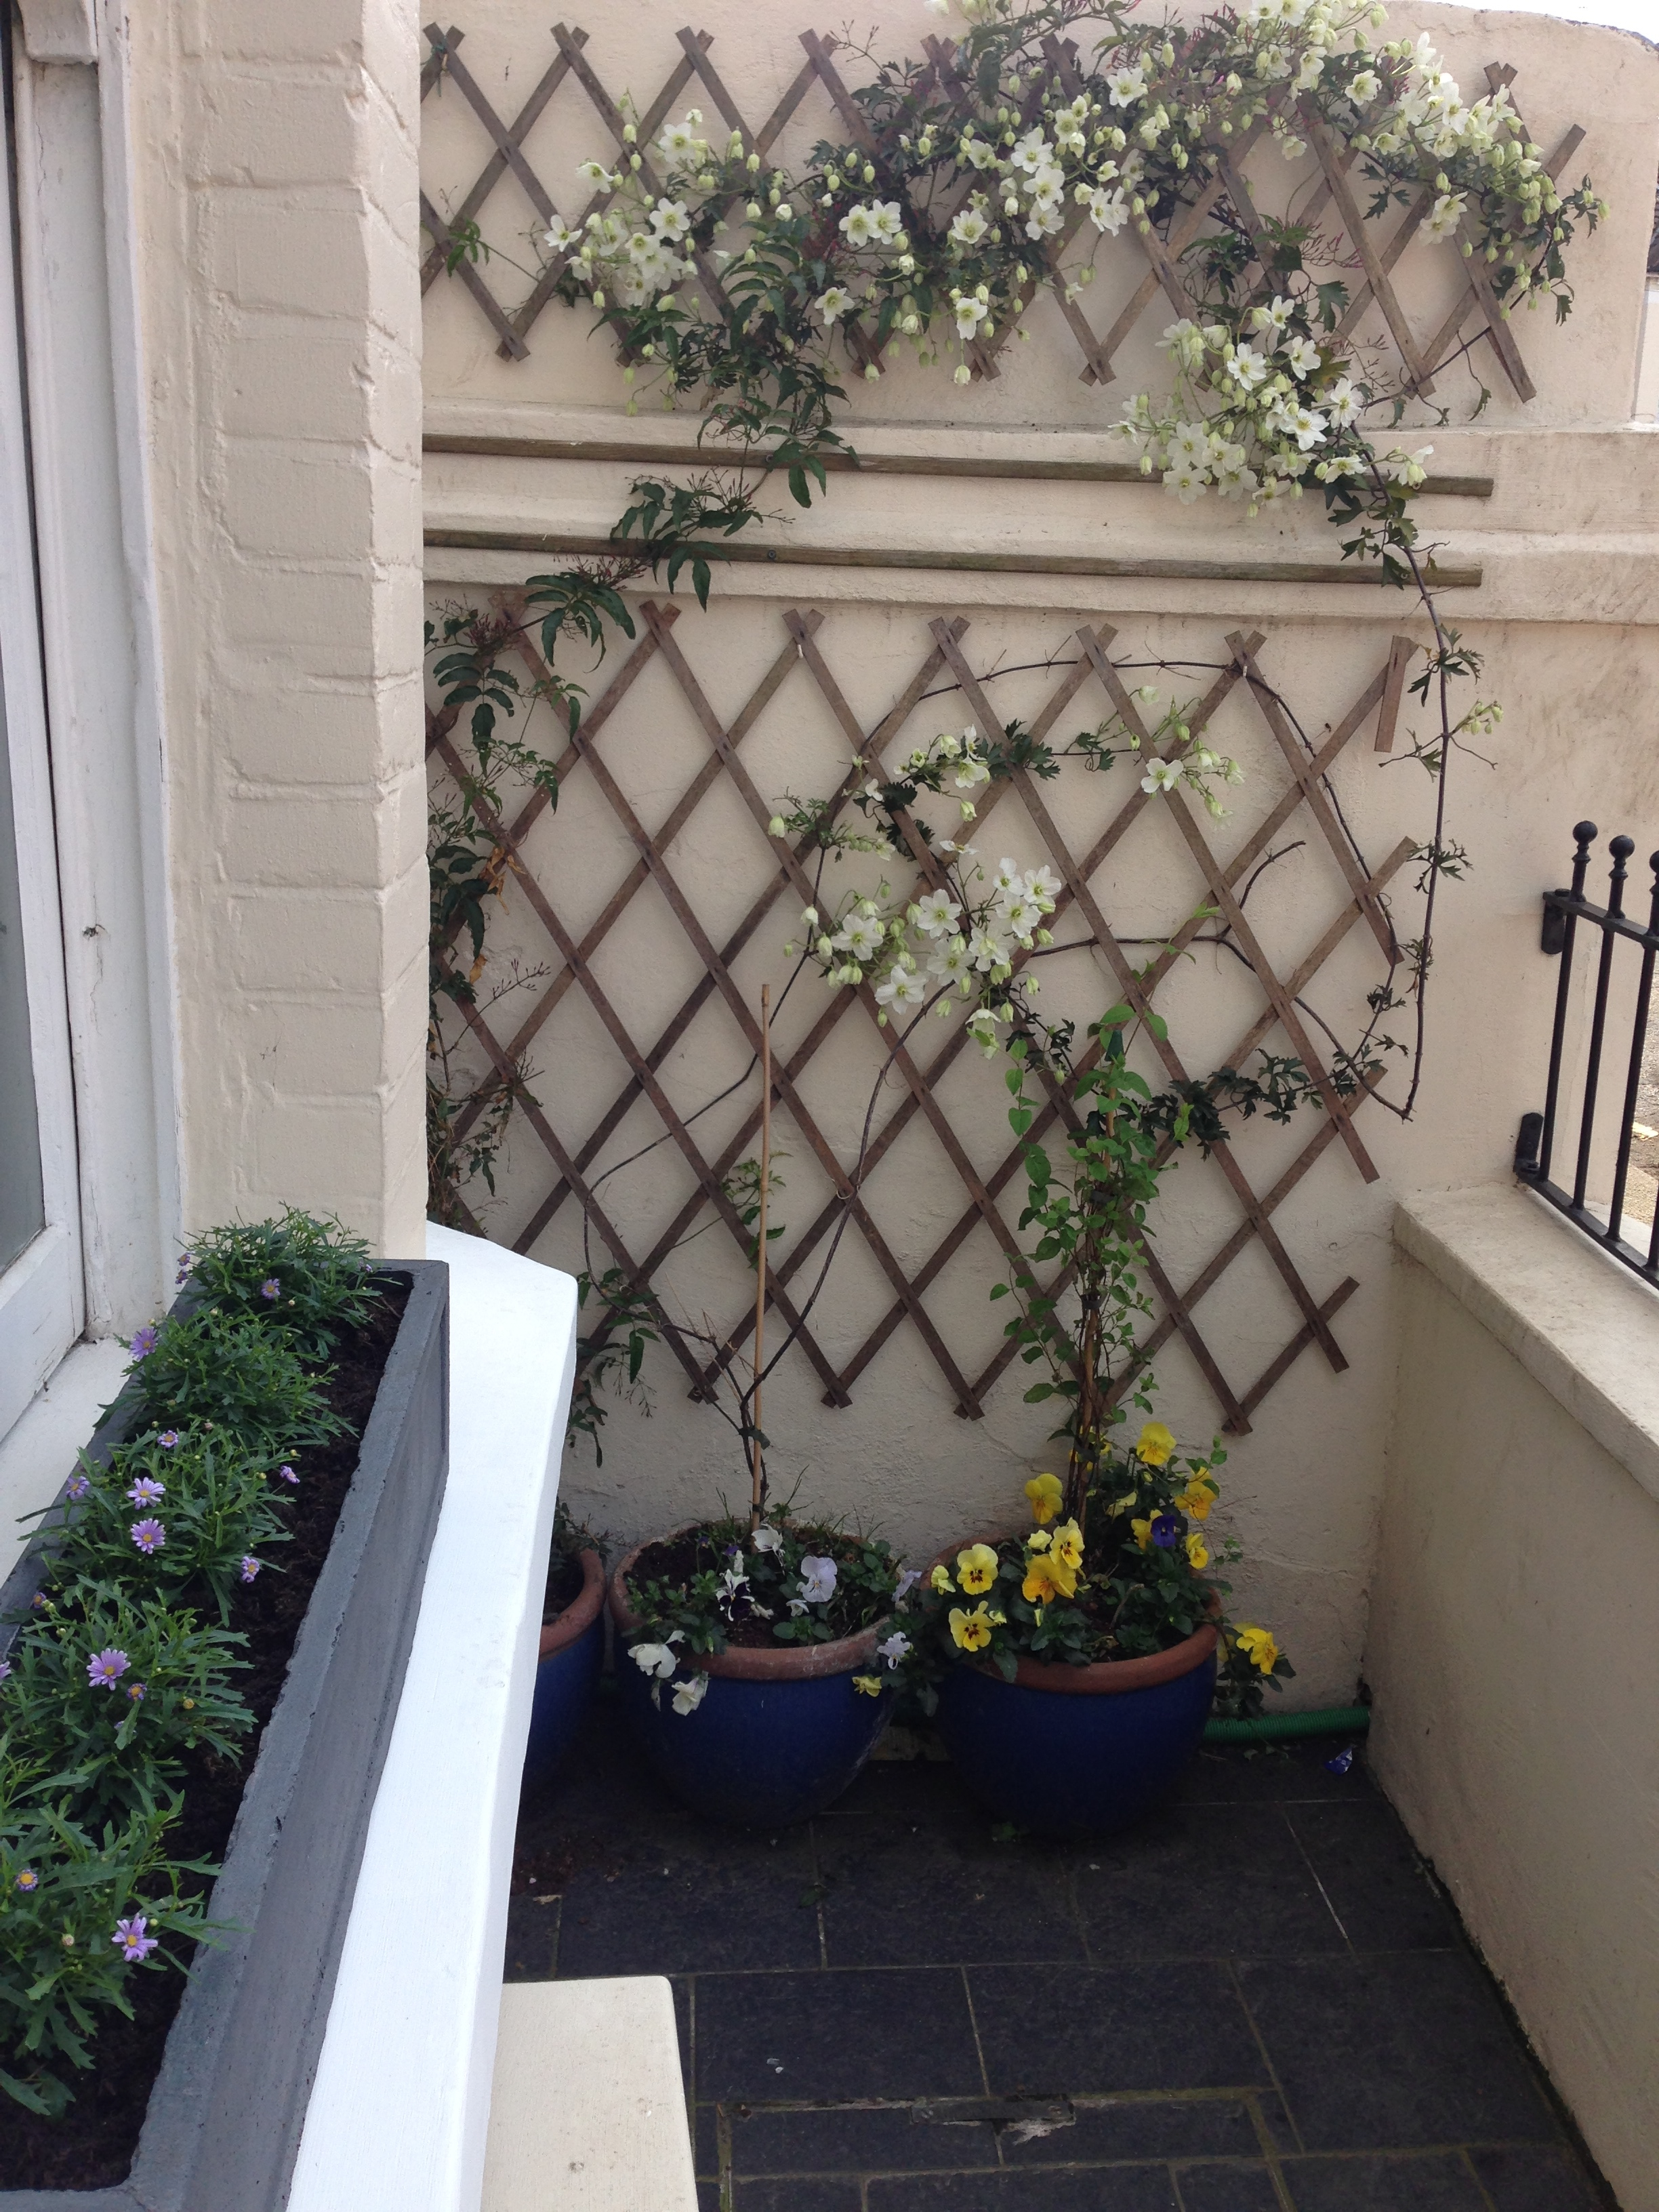 littlebury 2014 flower power jack wallington garden. Black Bedroom Furniture Sets. Home Design Ideas